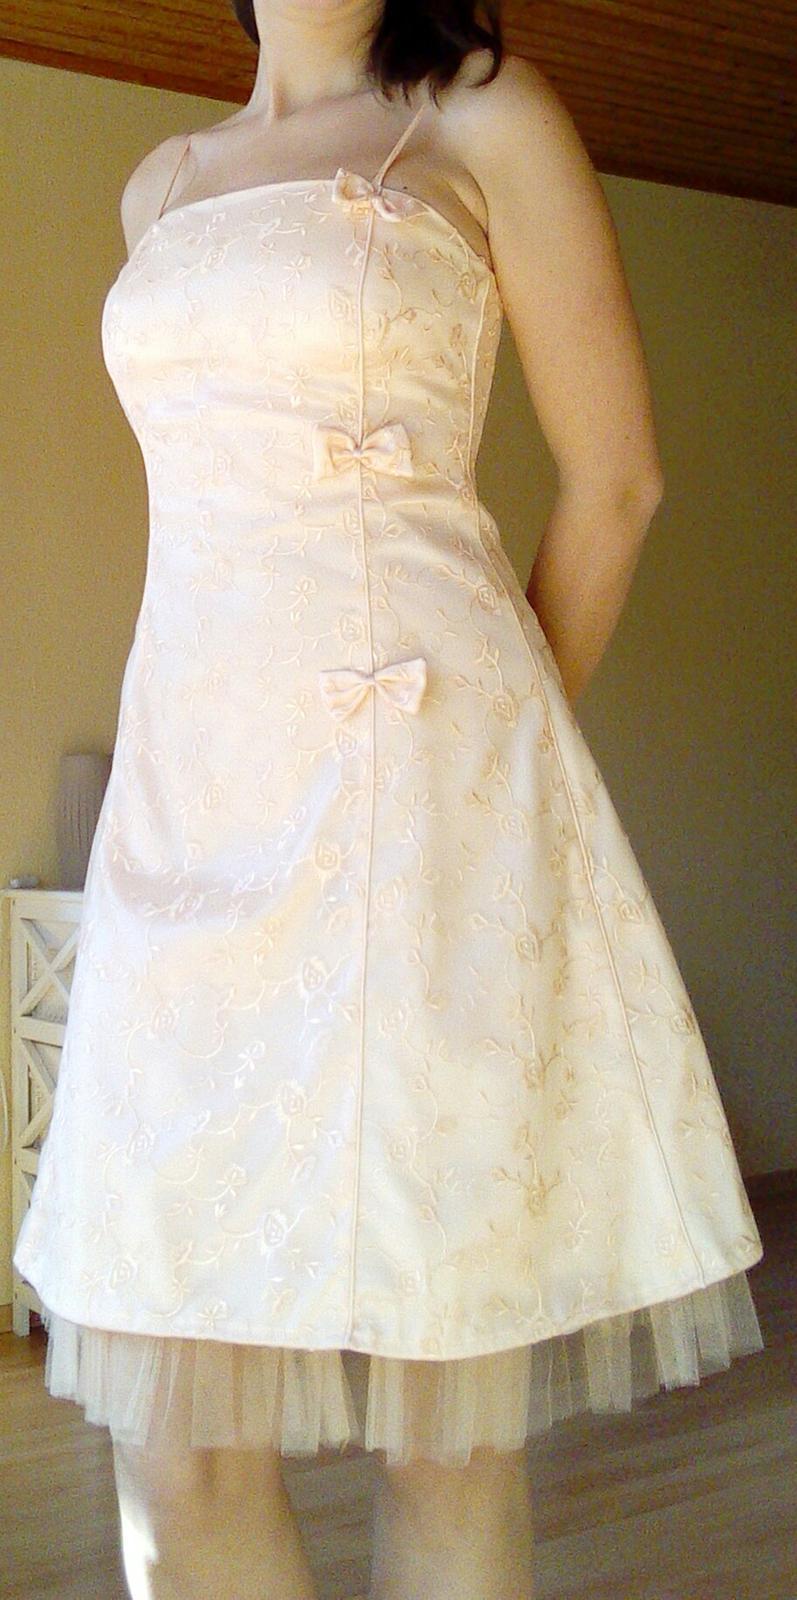 d0463d327c56 Krátke šaty